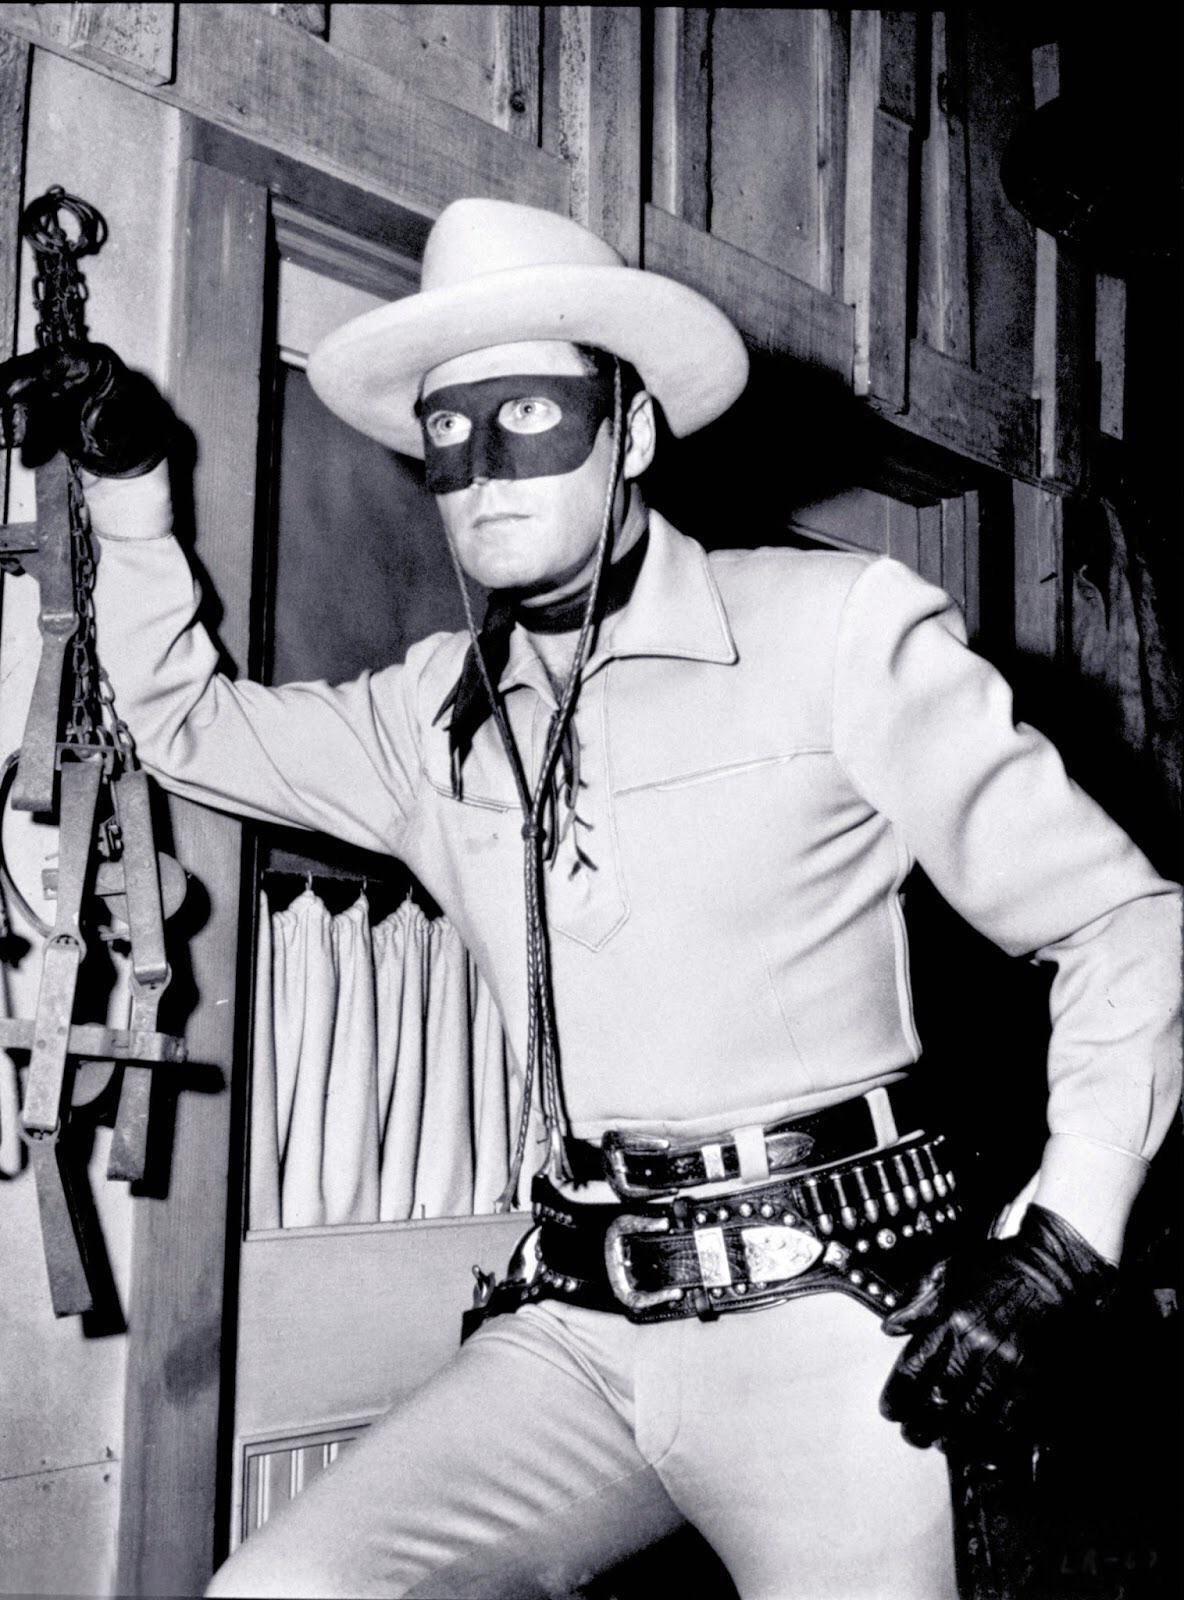 Lone Ranger tests positive for COVID. Tonto blames mask design.